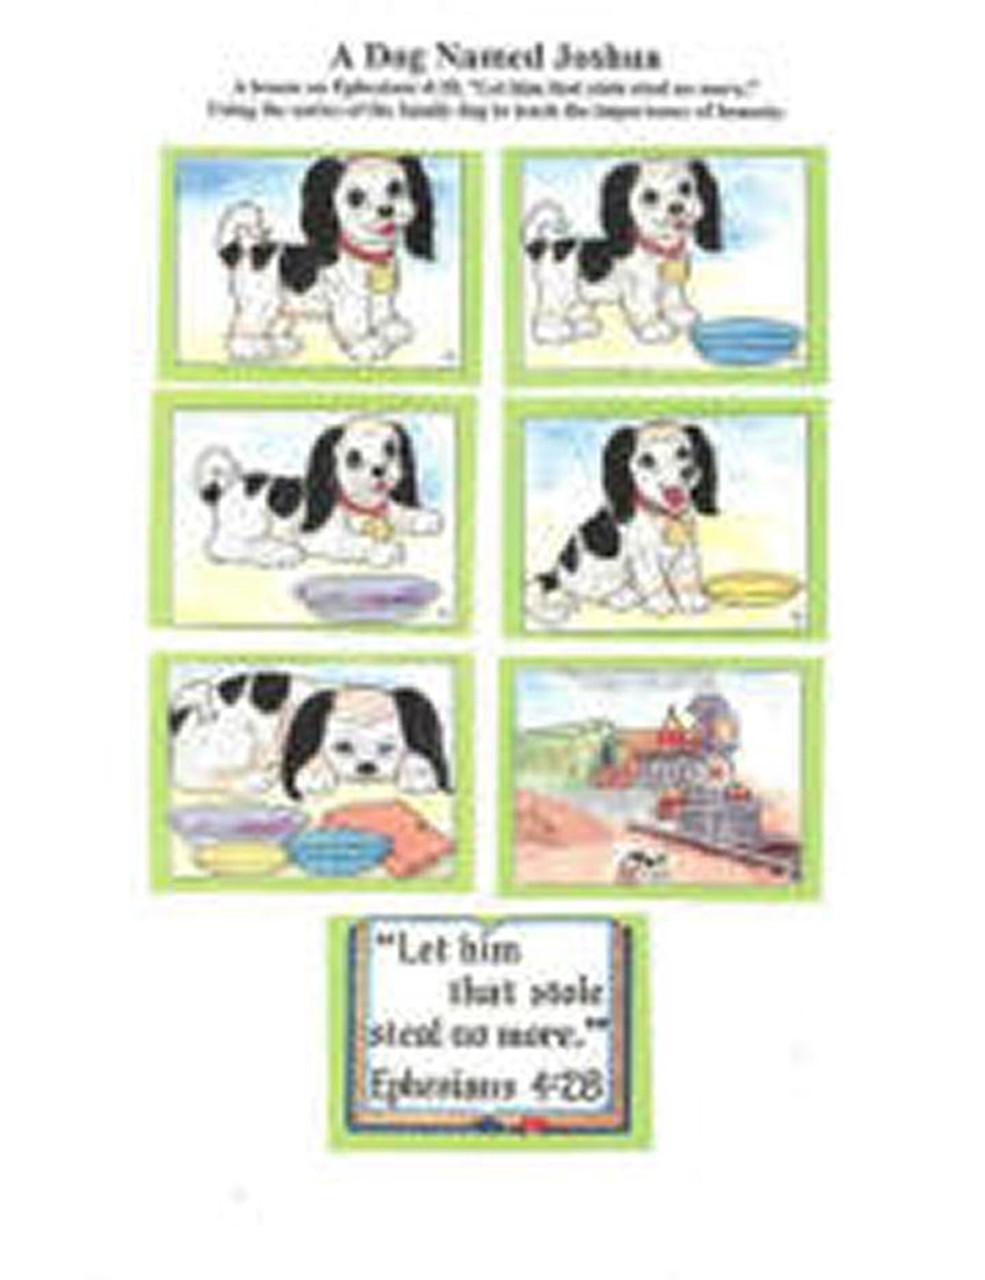 A Dog Named Joshua (object story)